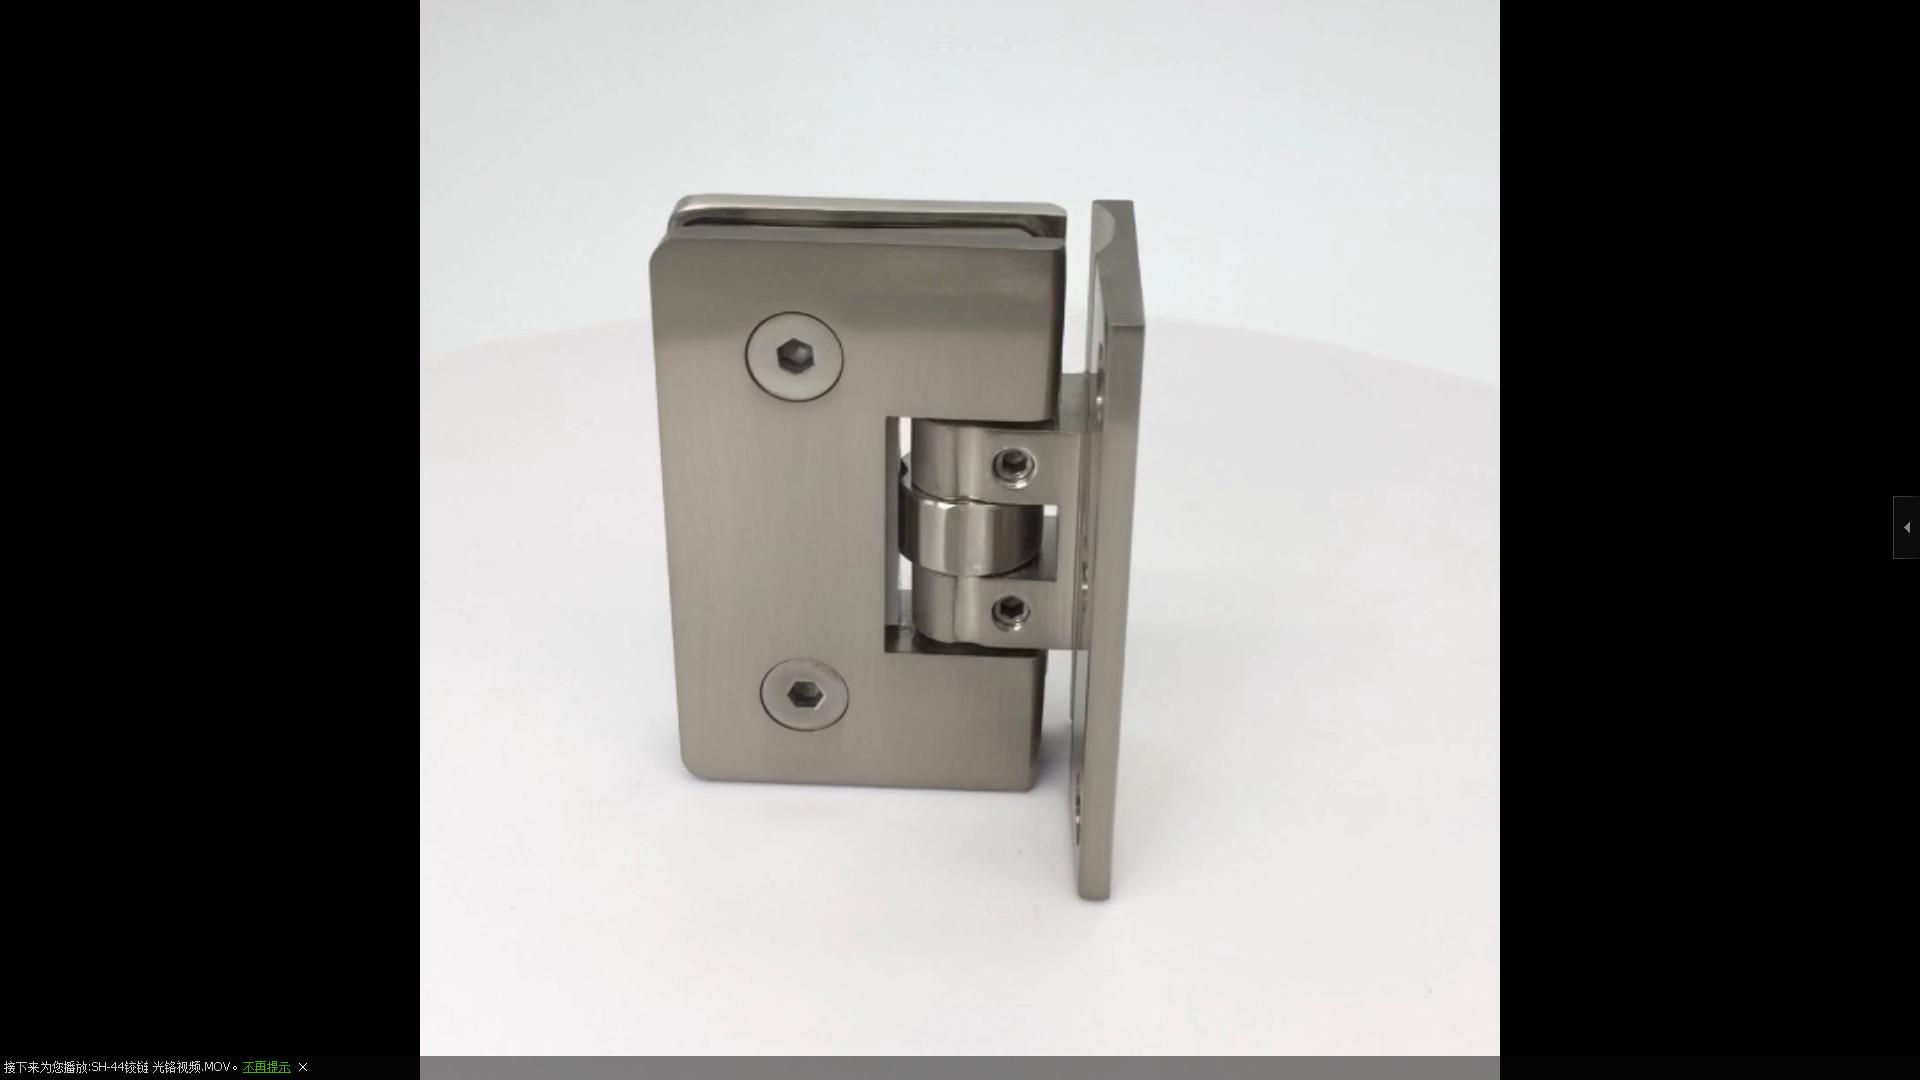 SH-44-T2AD sand nickel video-JY